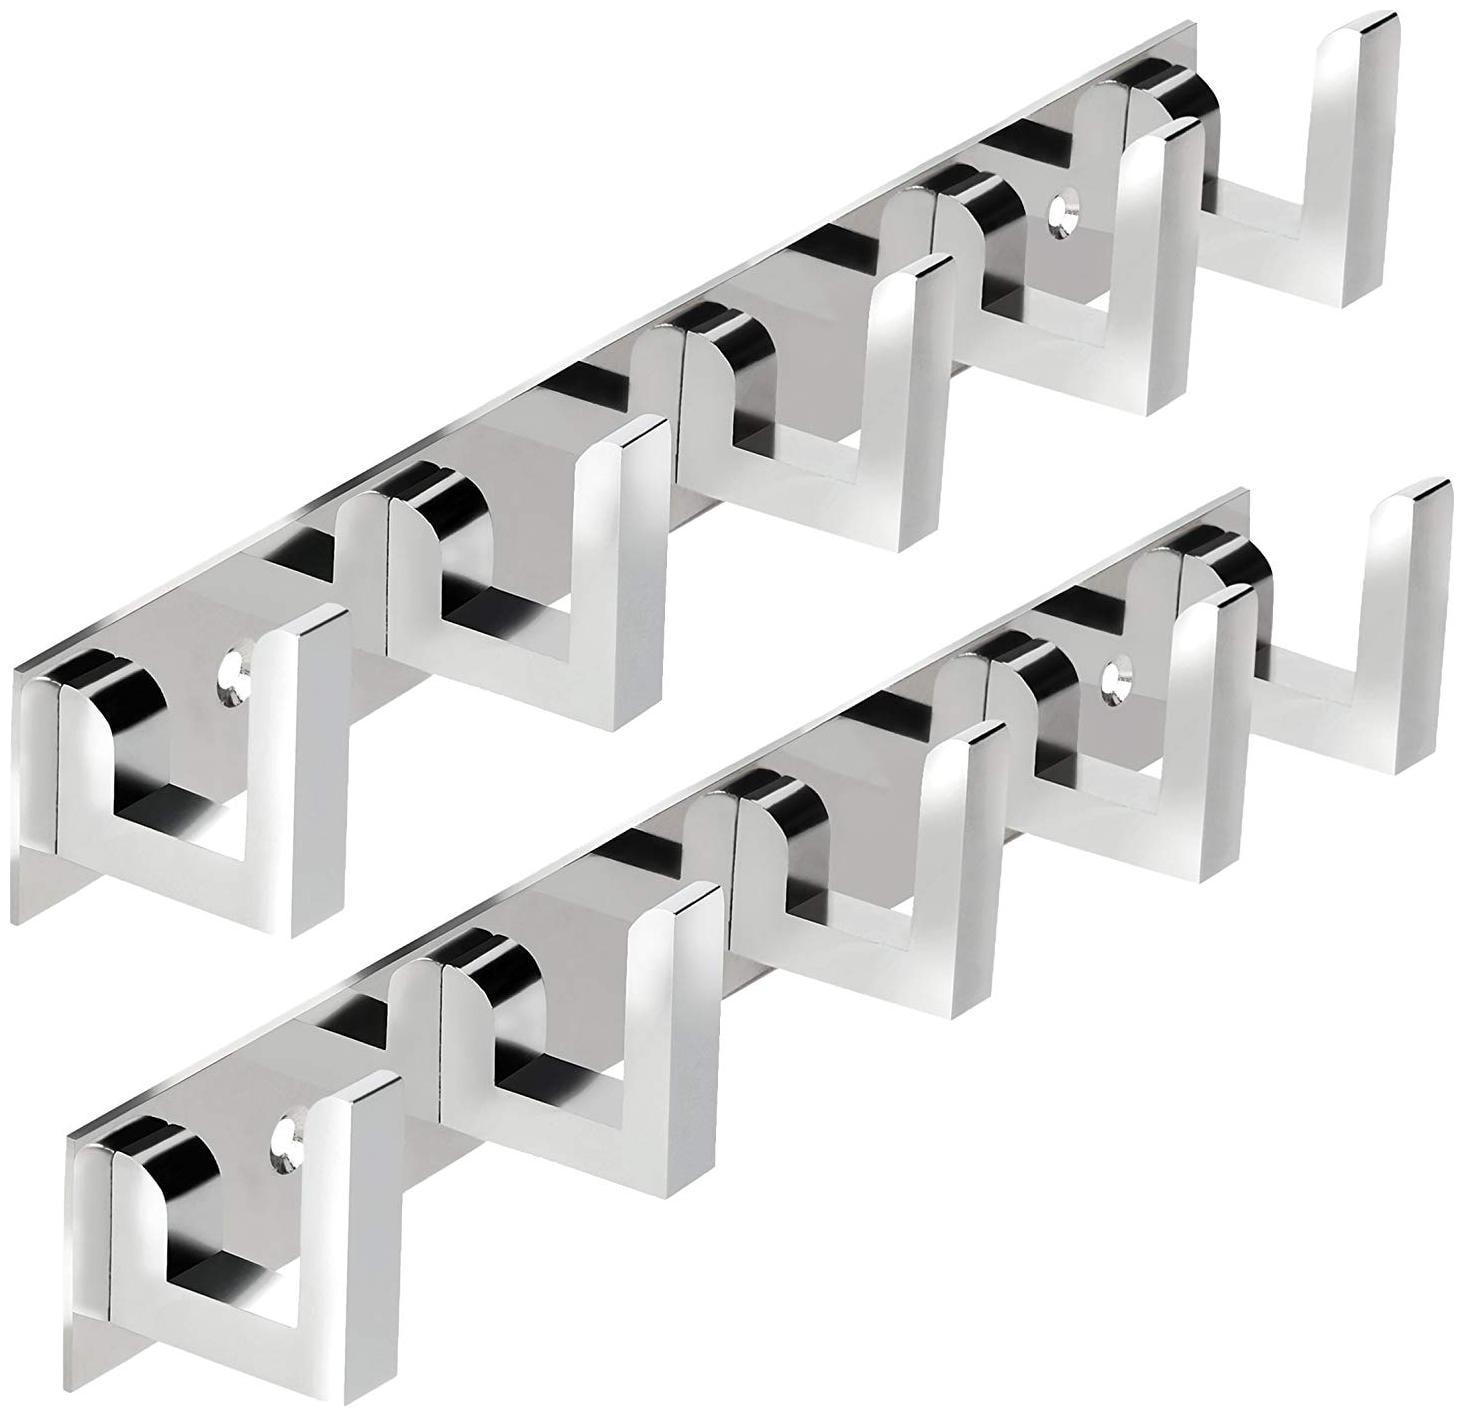 Darkline Glossy Classic 5 Pin Bathroom Cloth Hanger Door Wall Hooks For Hanging keys;Clothes Holder 5   Pronged Hook Rail